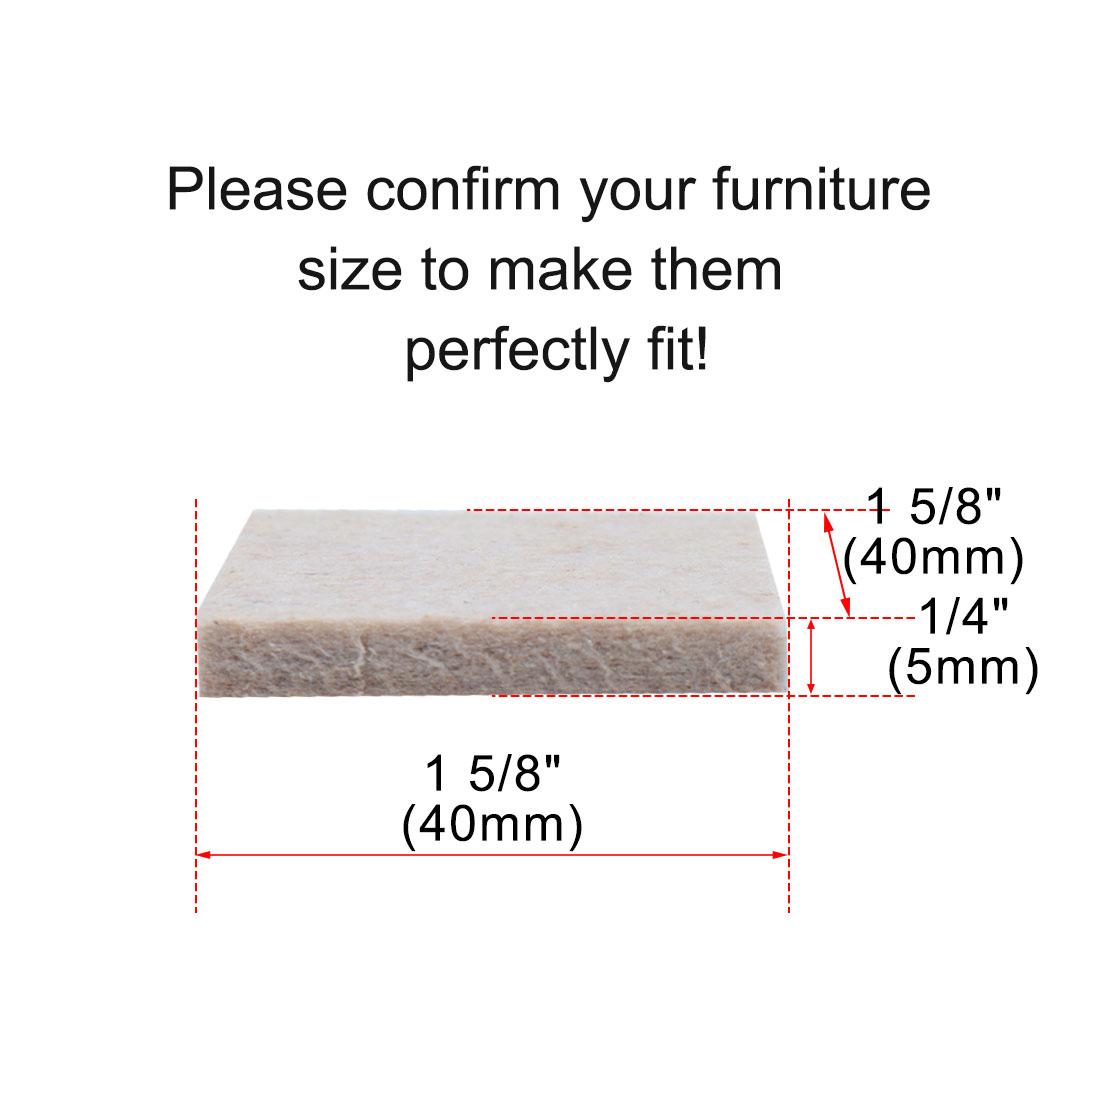 "Furniture Pads Square 1 5/8"" Self-stick for Furniture Floor Protector 12pcs - image 4 de 7"